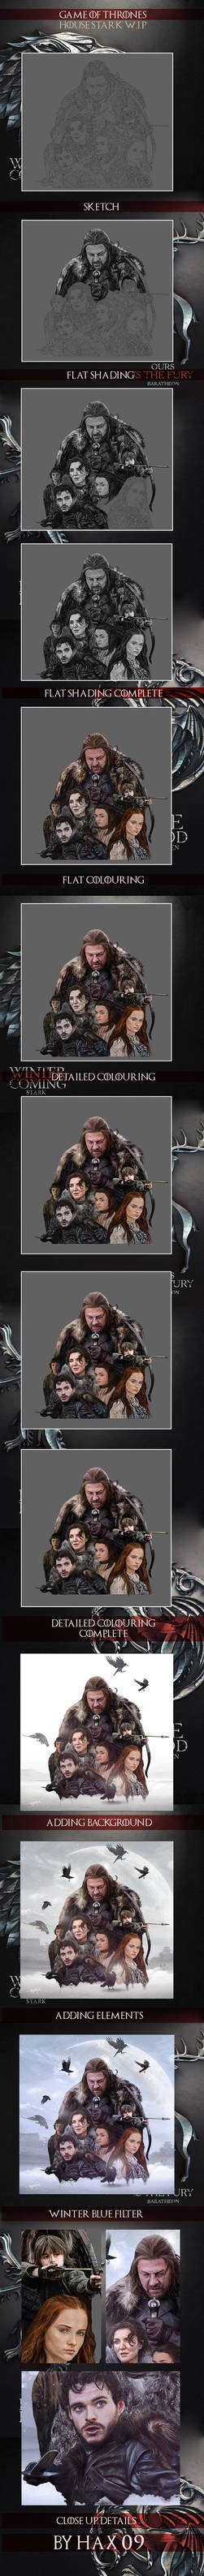 House Stark: Game of Thrones W.I.P